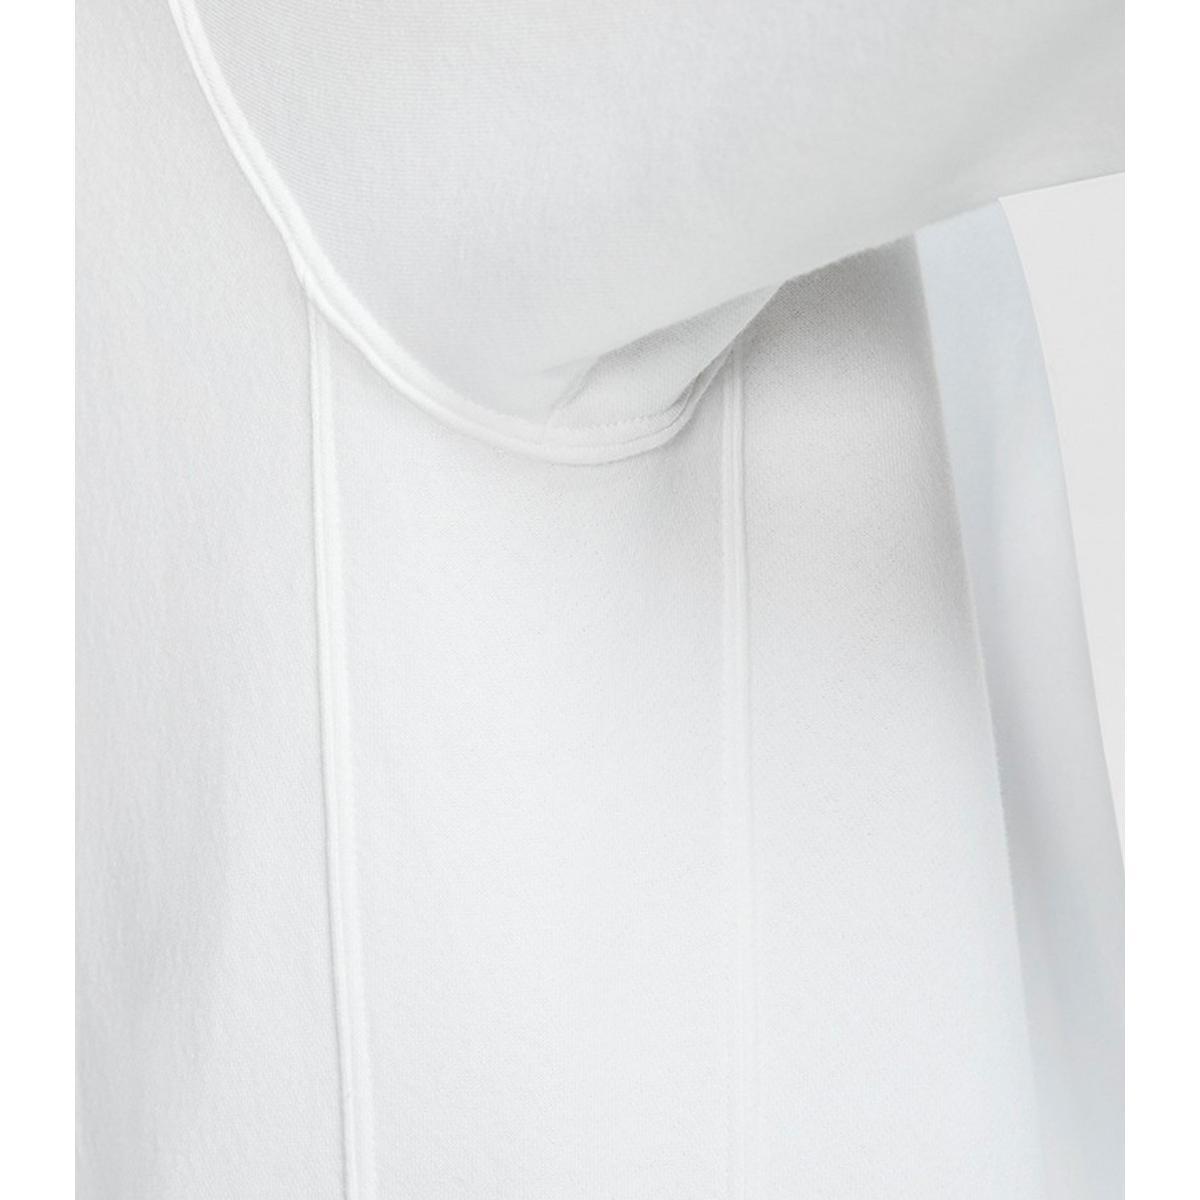 Felpa Nike Sportswear girocollo con stampa Just Do It da uomo rif. BV5089-100